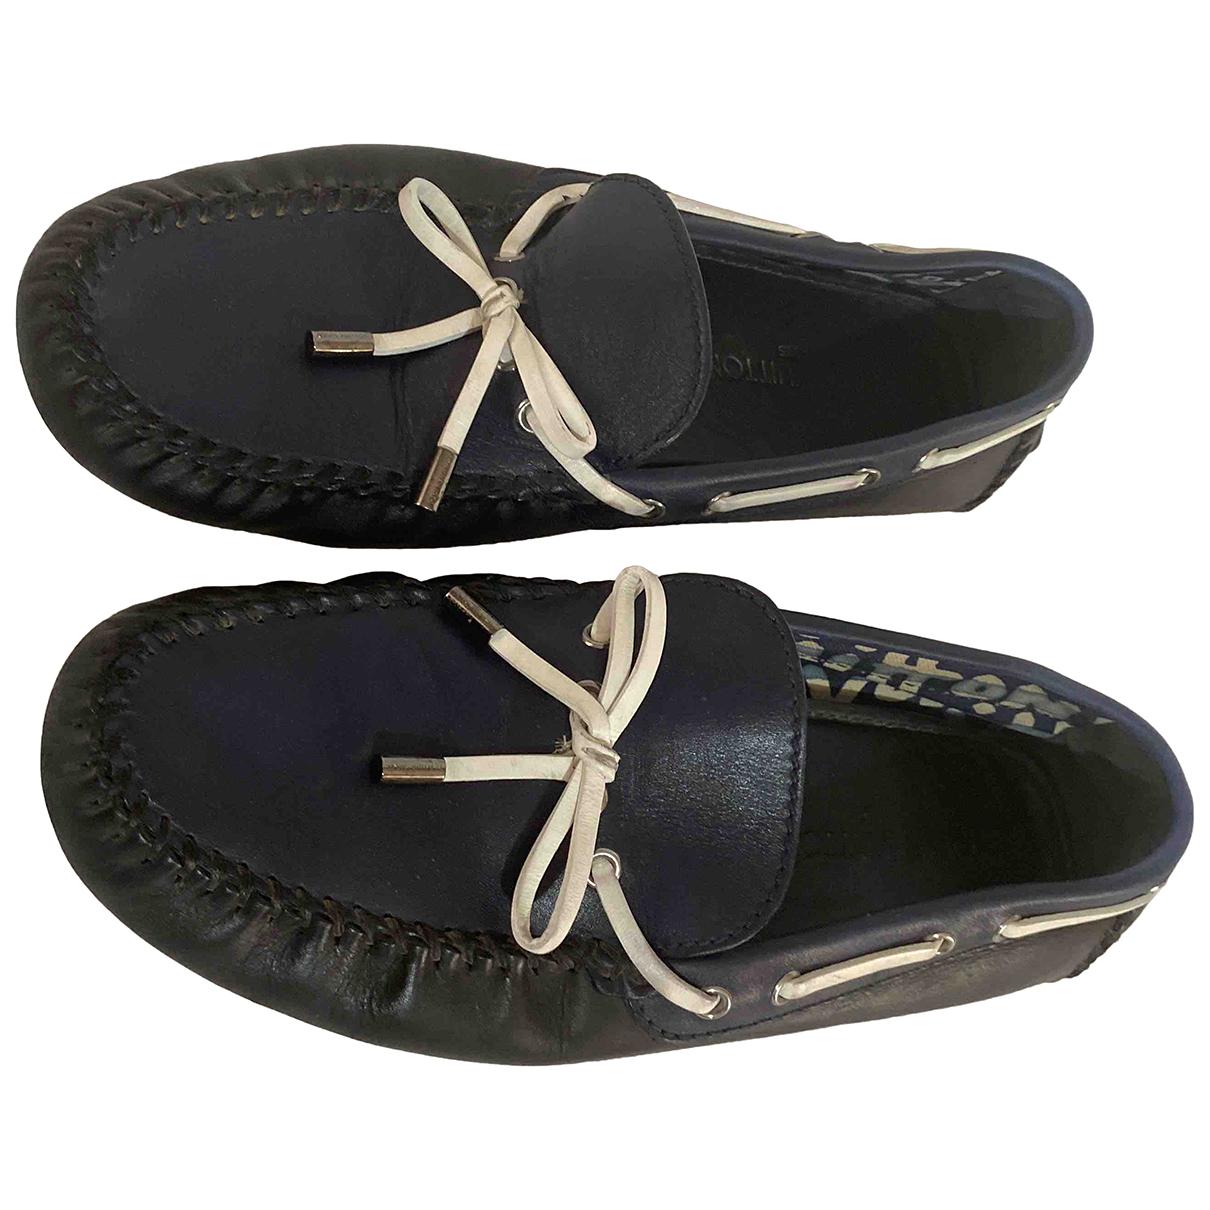 Louis Vuitton N Blue Leather Flats for Men 8.5 UK